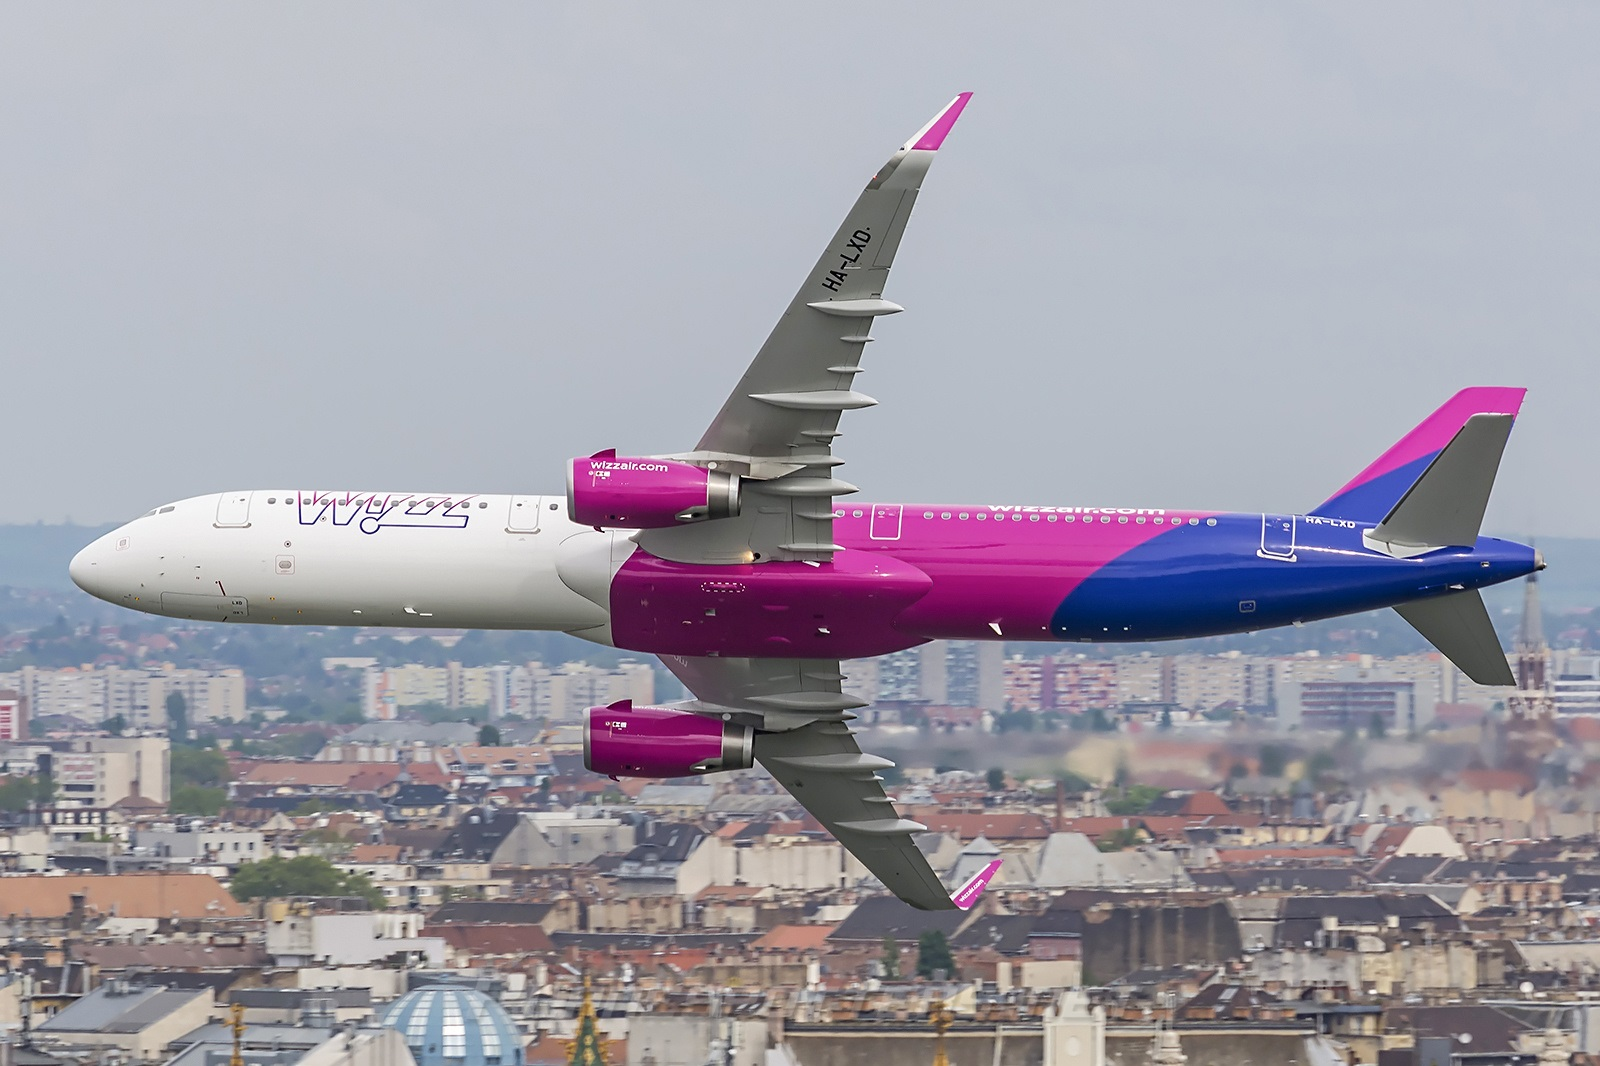 Airbus A321 маневрирует в небе над Будапештом